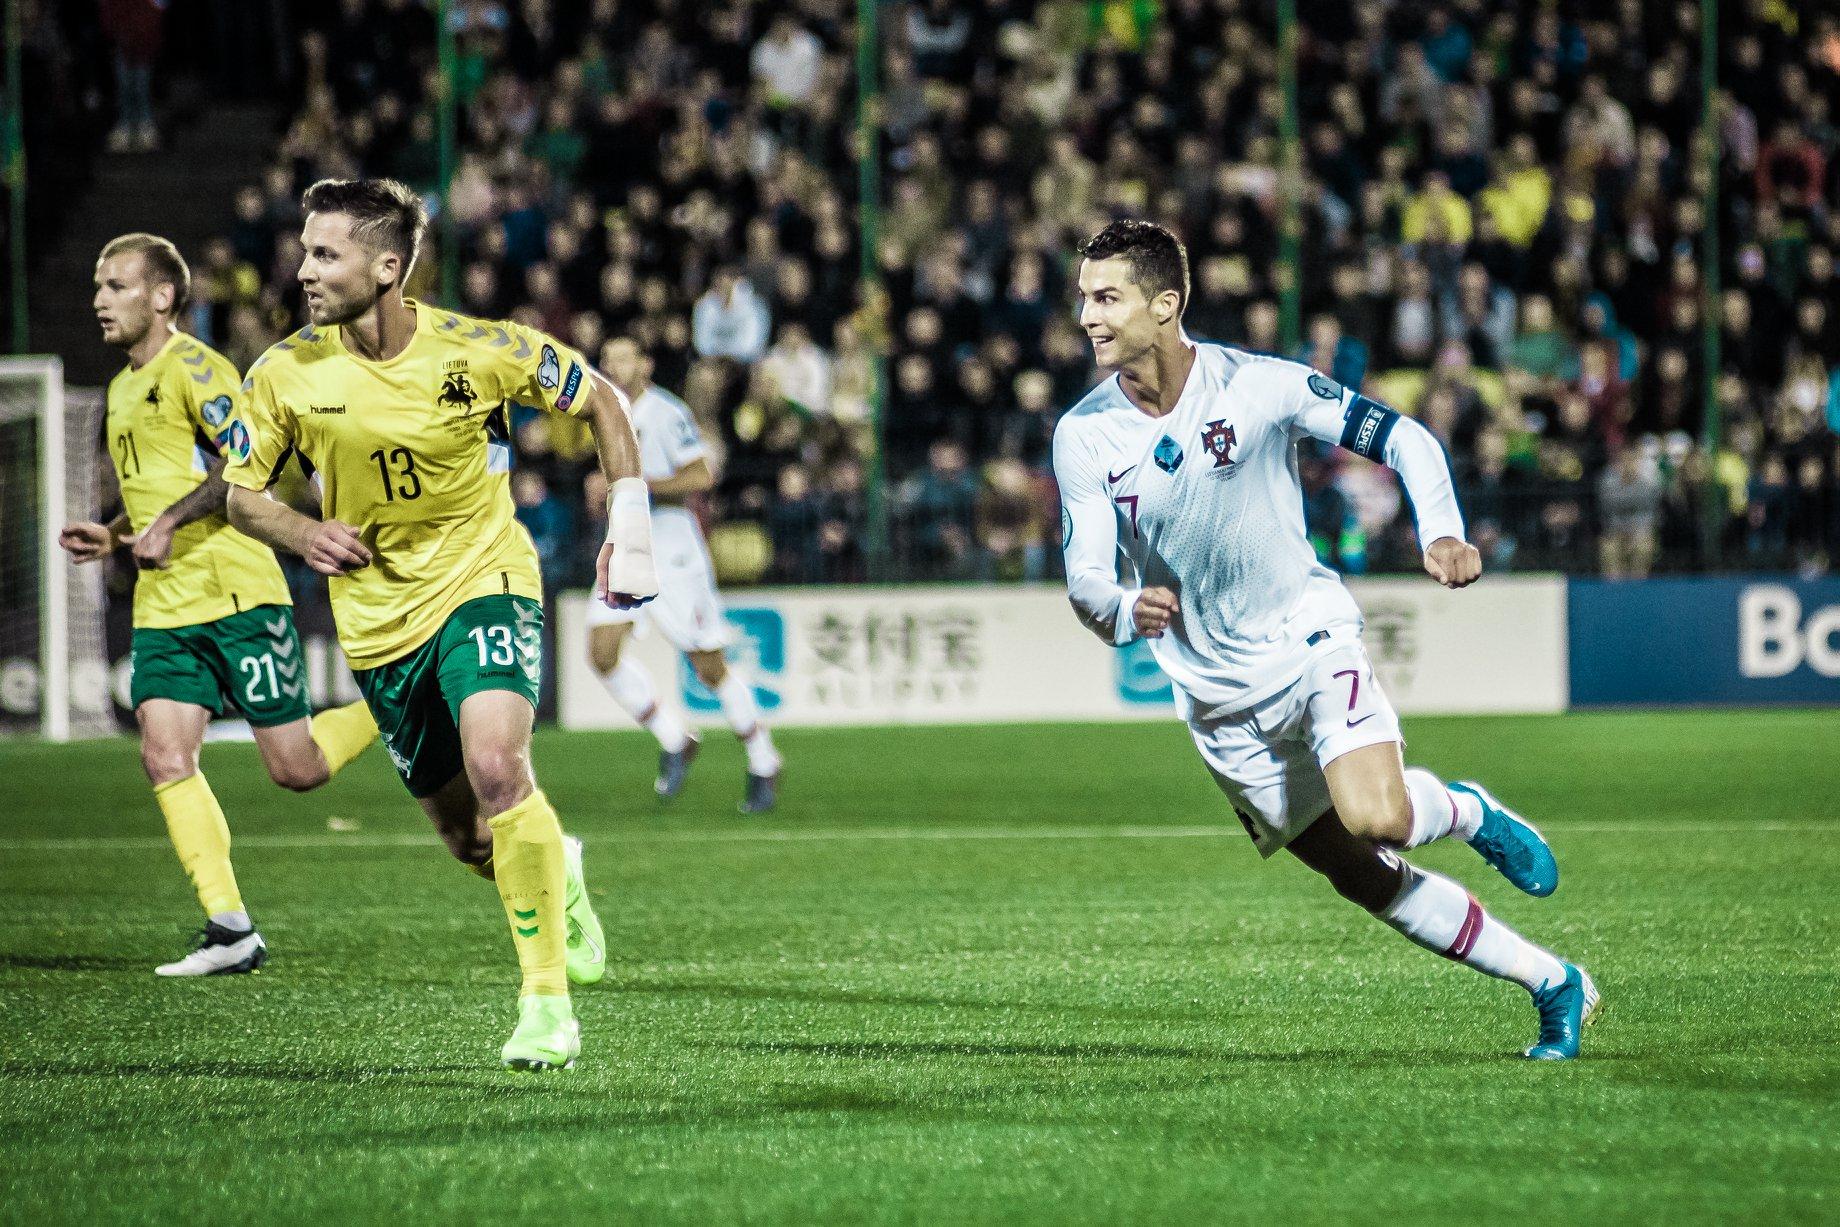 2019 09 10 Futbolas: Lietuva v Portugalija 1:5